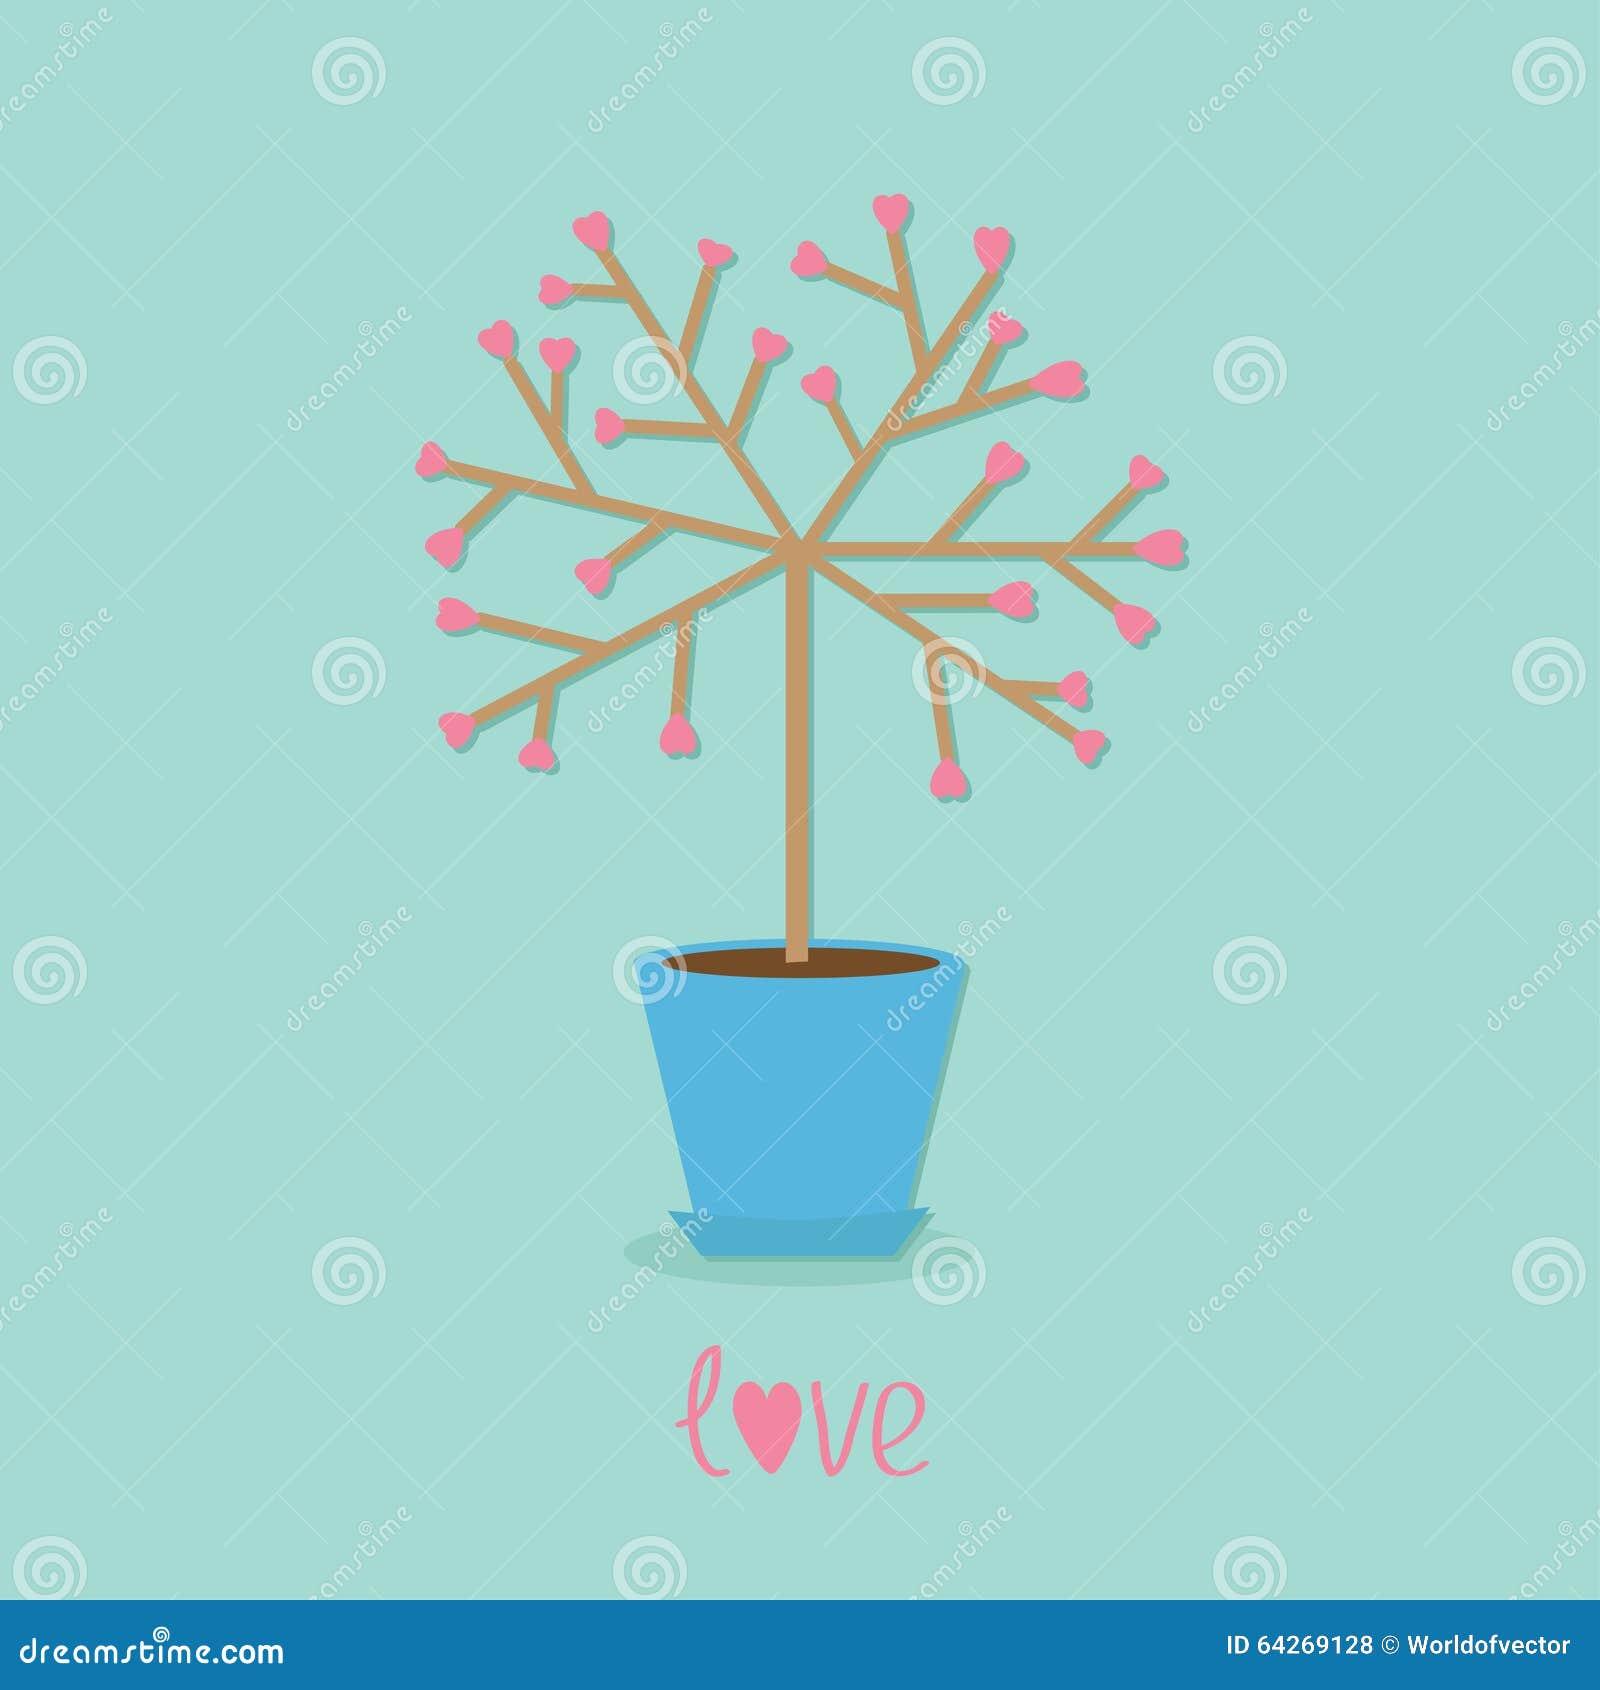 love tree in the pot heart flower word love blue background flat